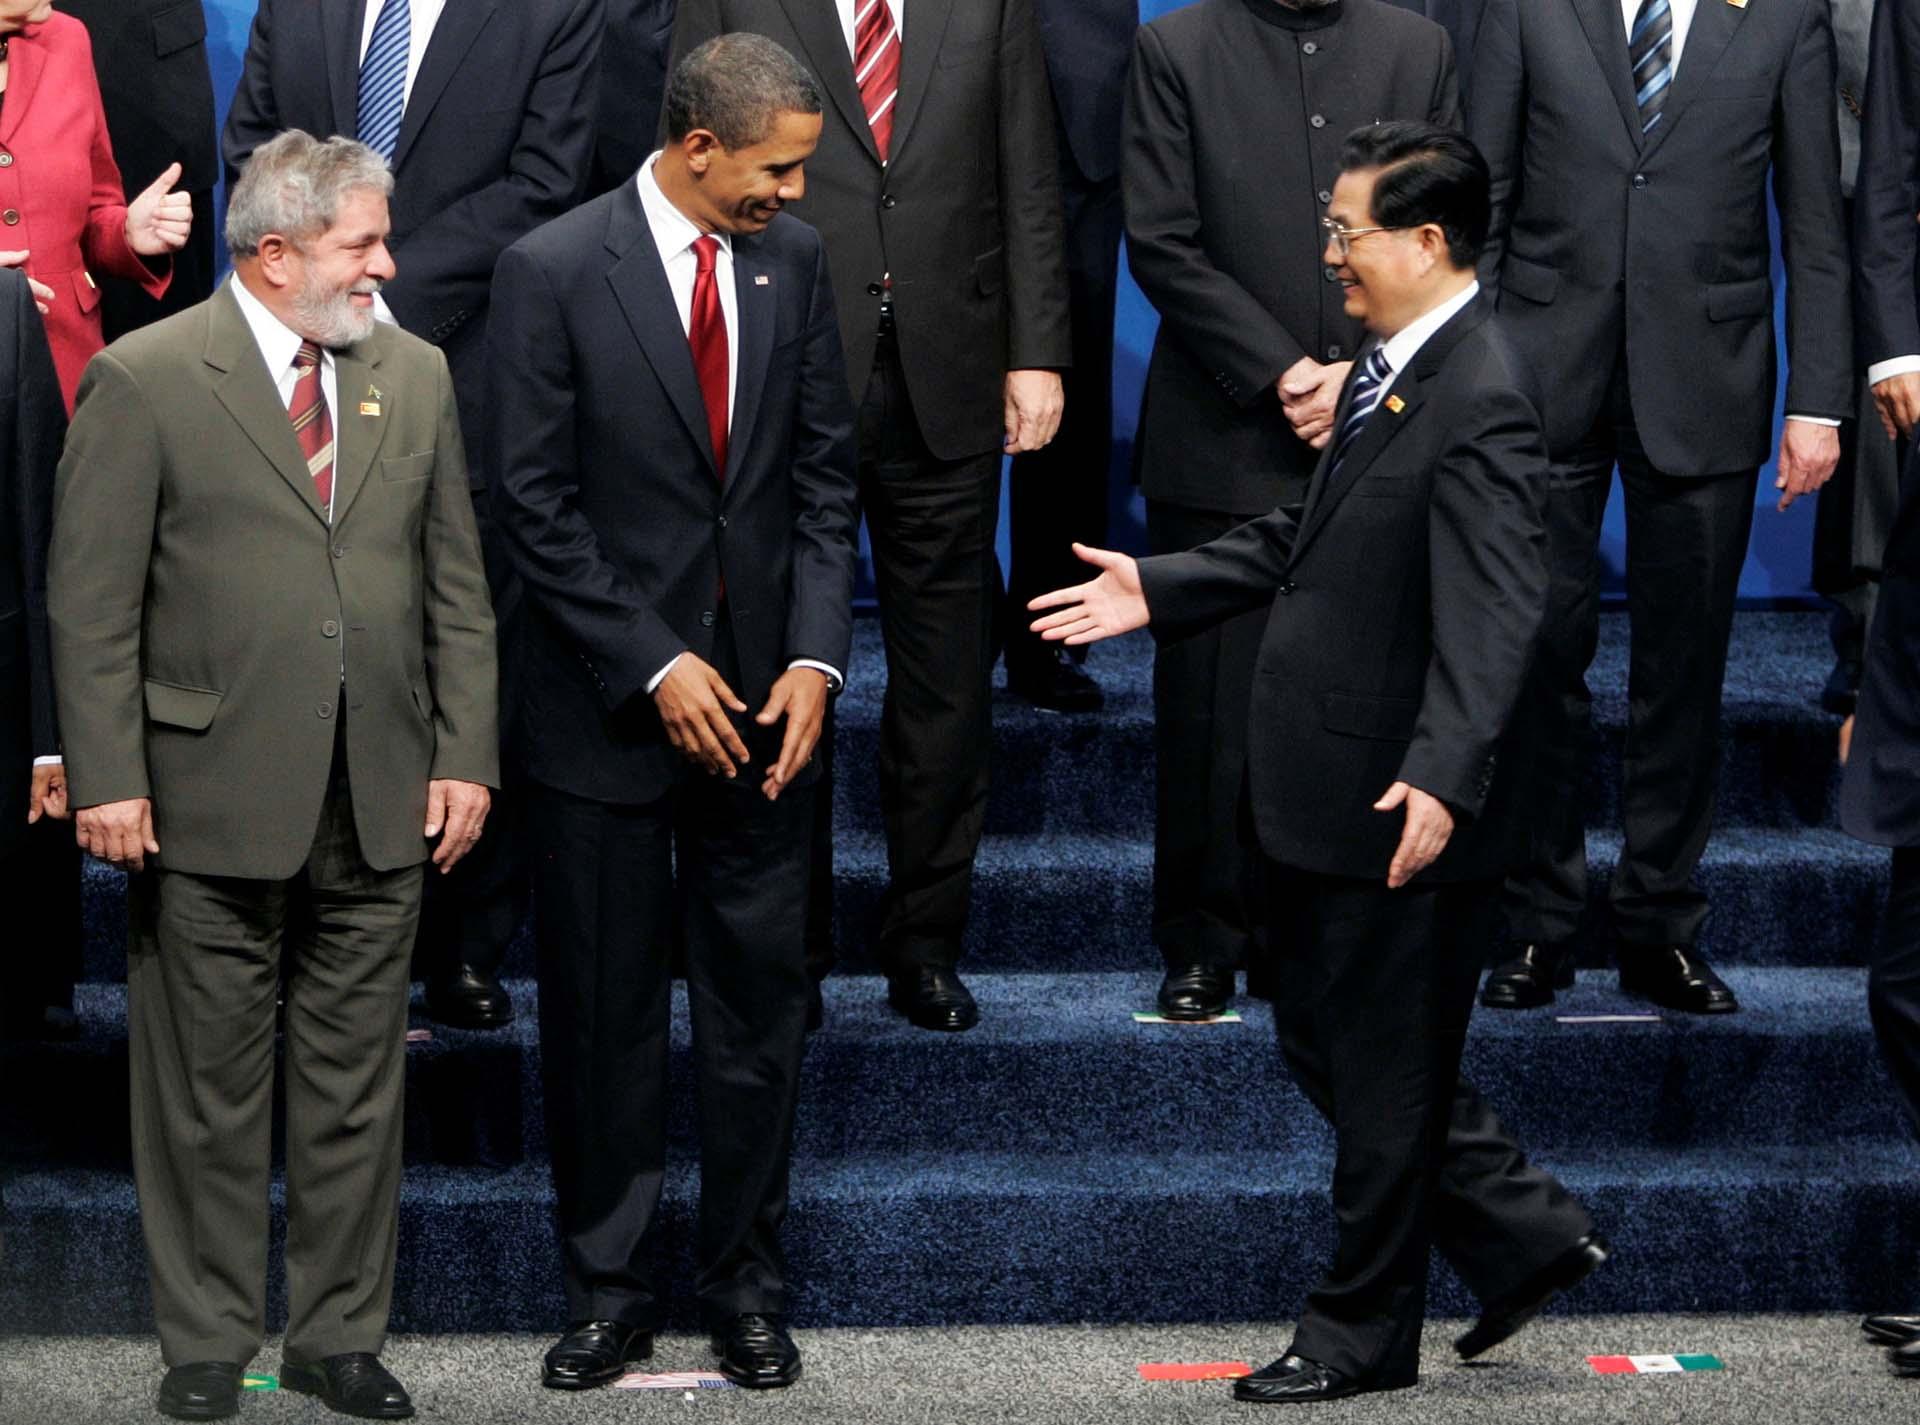 Lula da Silva, Barack Obama y el ex presidente chino, Hu Jintao, durante la cumbre del G20 celebrada en Pittsburgh, Pensilvania, el 25 de septiembre de 2009 (Reuters/Jim Bourg)